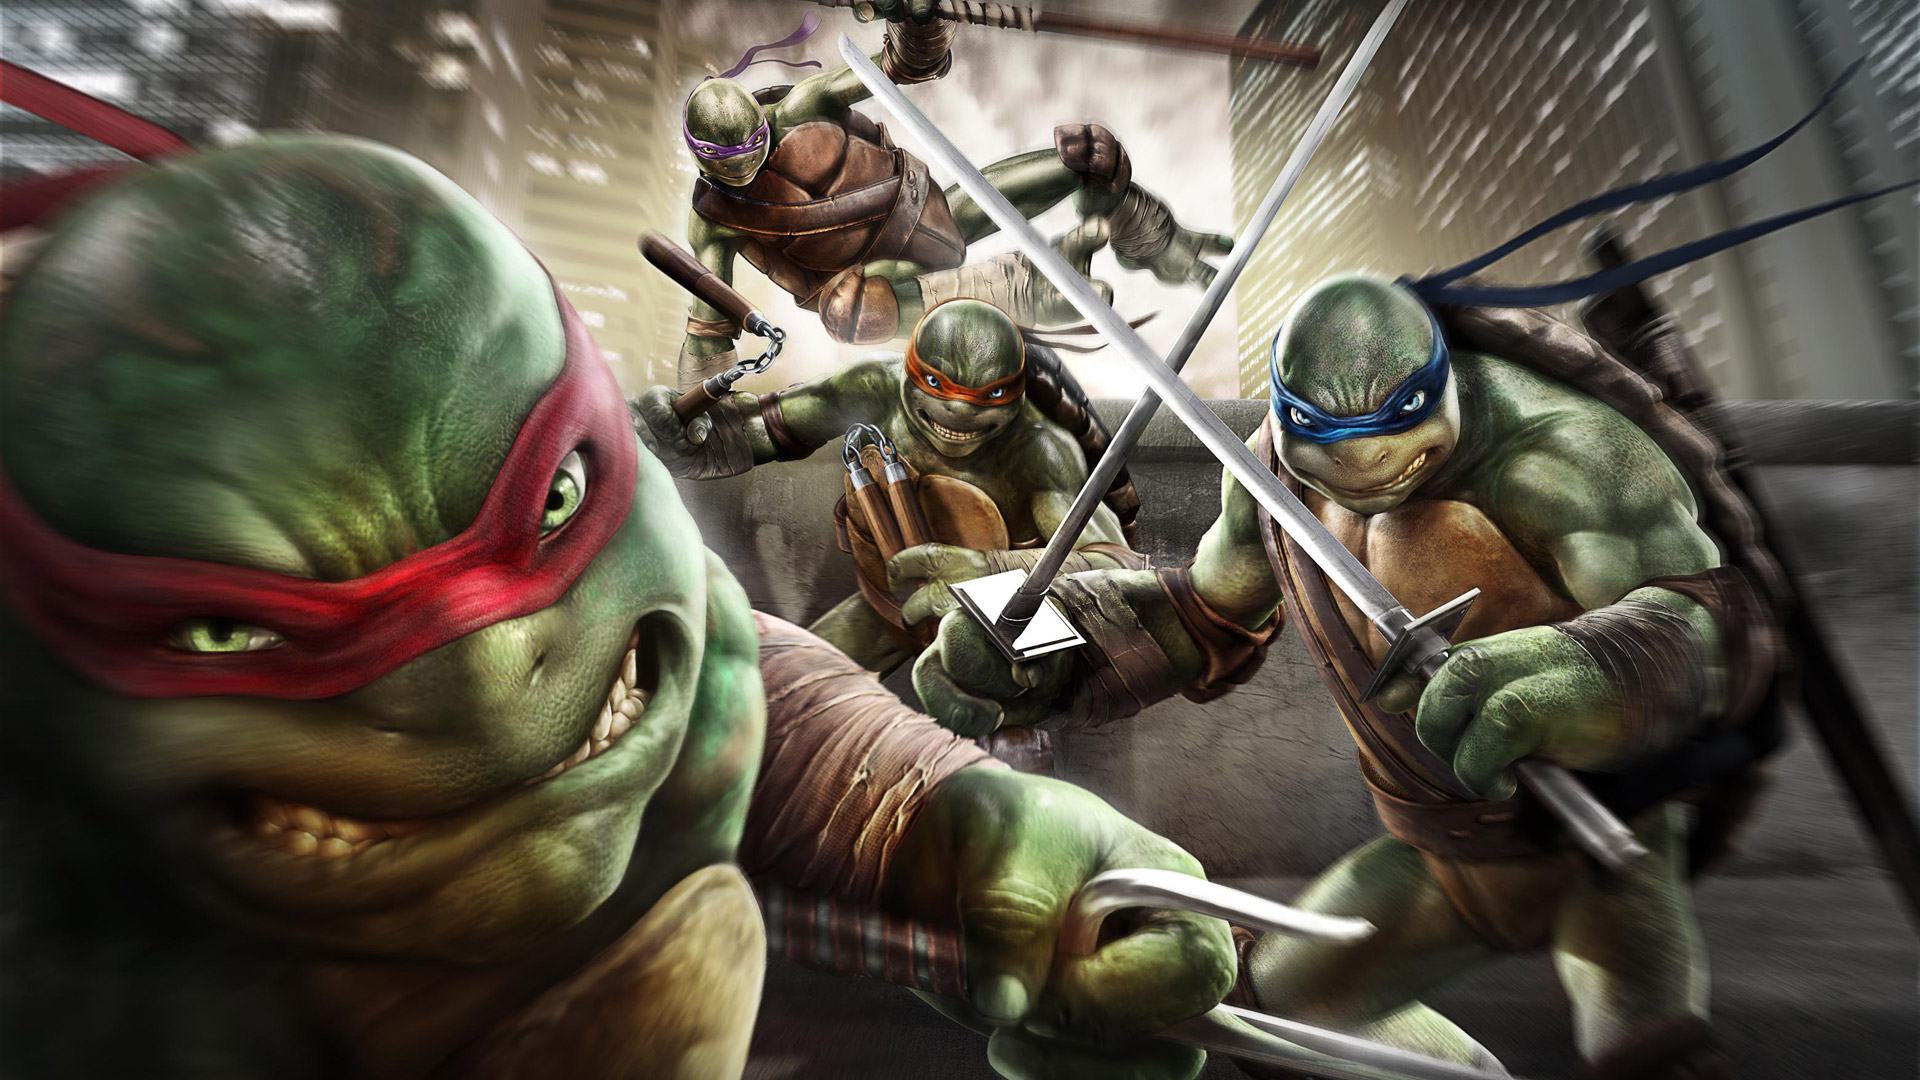 Teenage Mutant Ninja Turtles: Out of the Shadows Wallpaper in 1920x1080